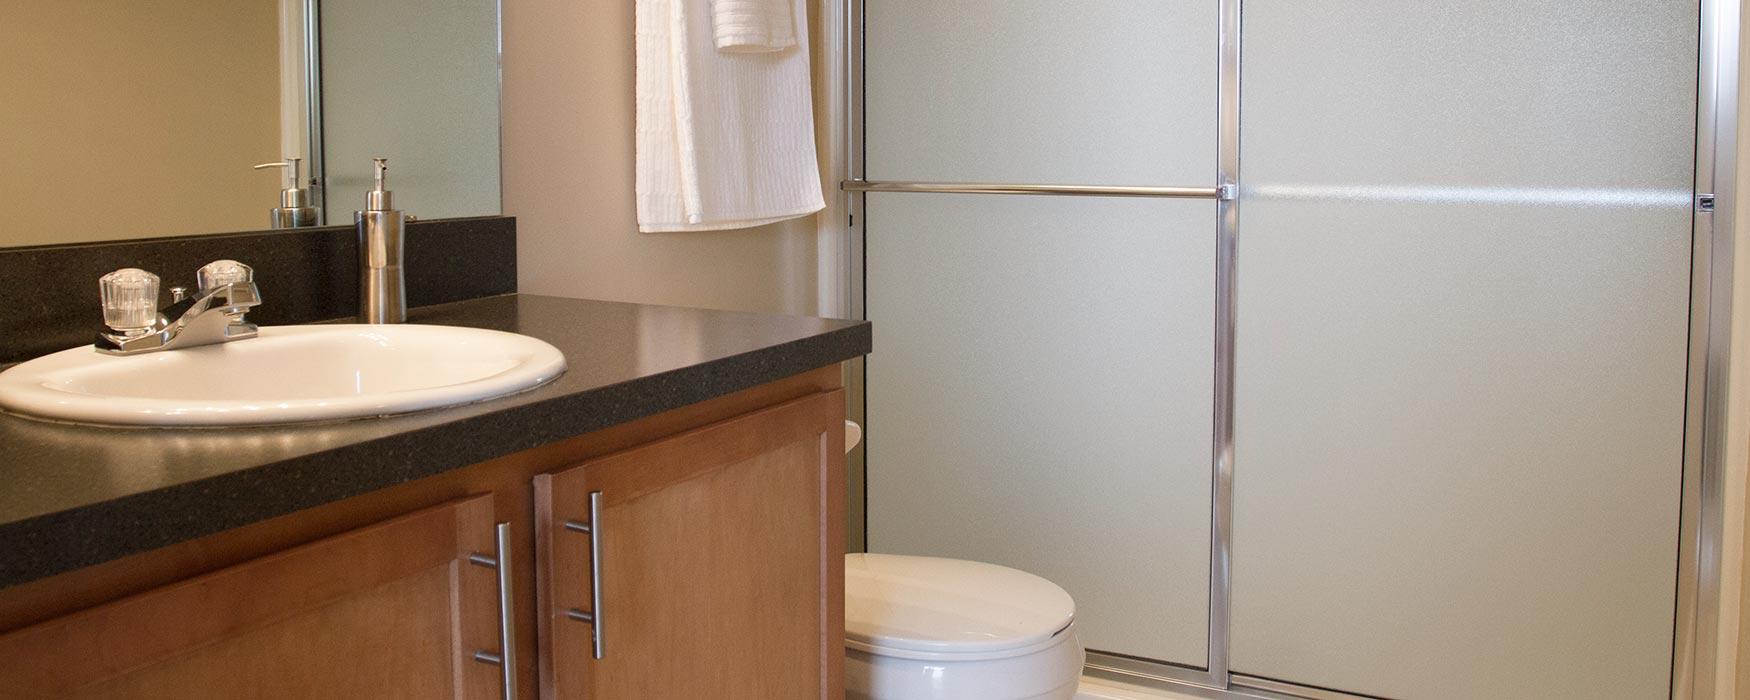 1 bedroom apartment dublin ohio white wood bedroom furniture 1 ...